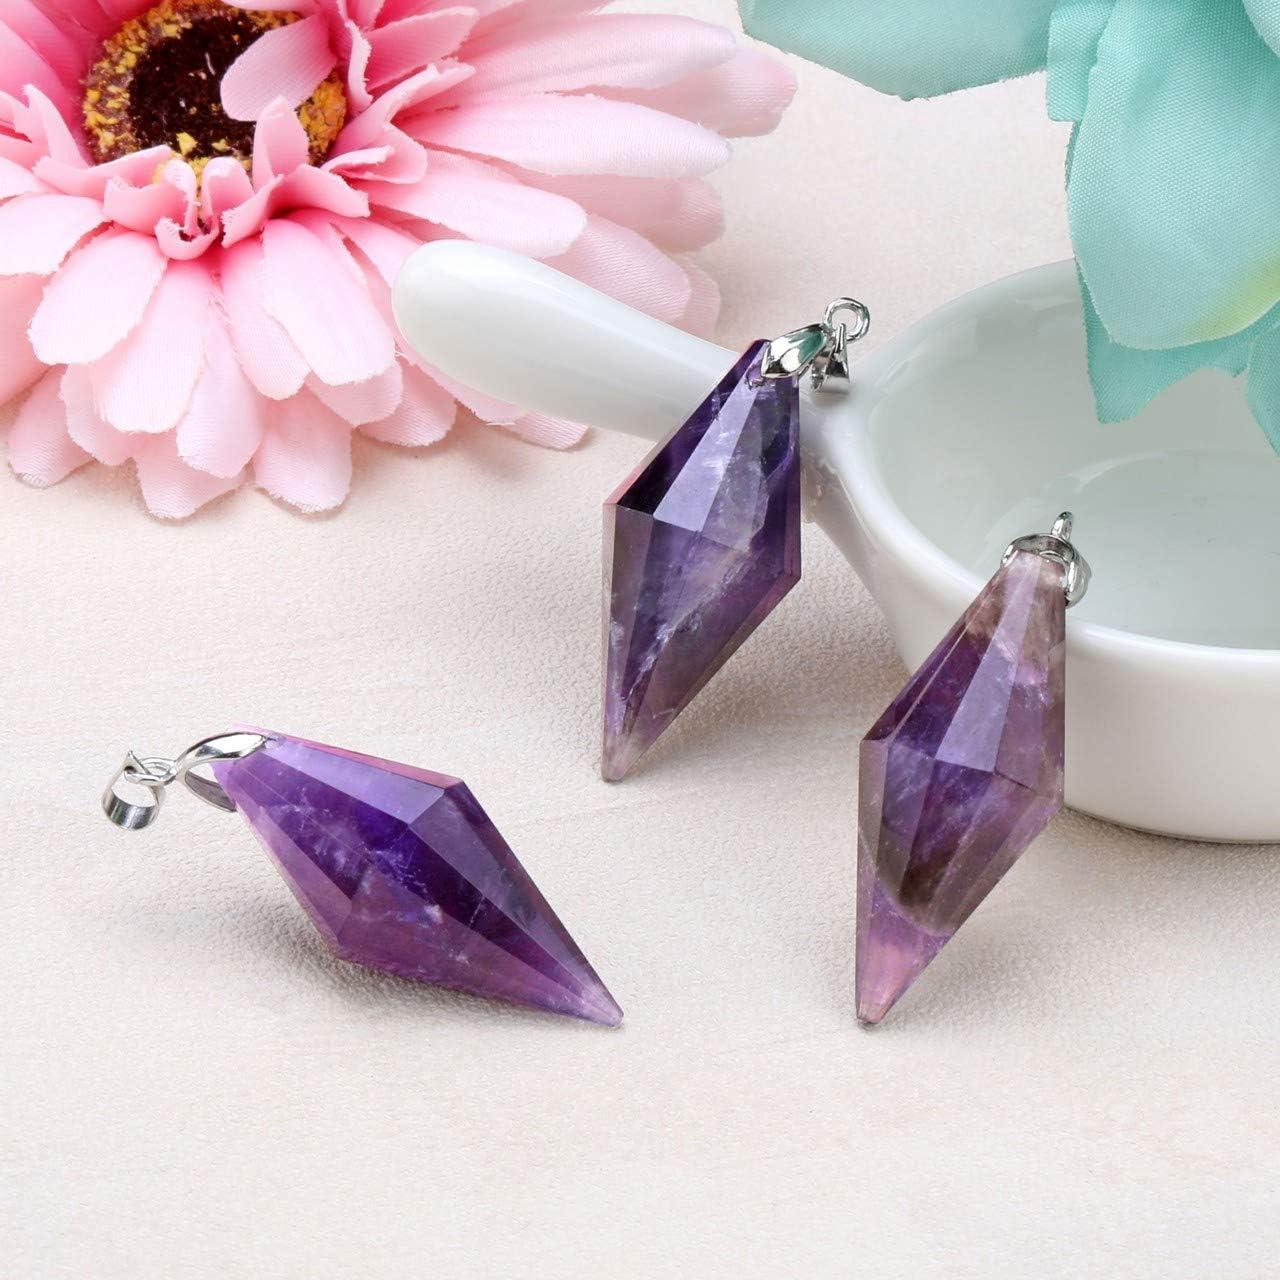 Black Obsidian Crystal Quartz Necklace \u2022 Grey Moonstone Pendant \u2022 Unique Style \u2022 Metalwork \u2022 Soldered Jewelry \u2022 Nature Inspire